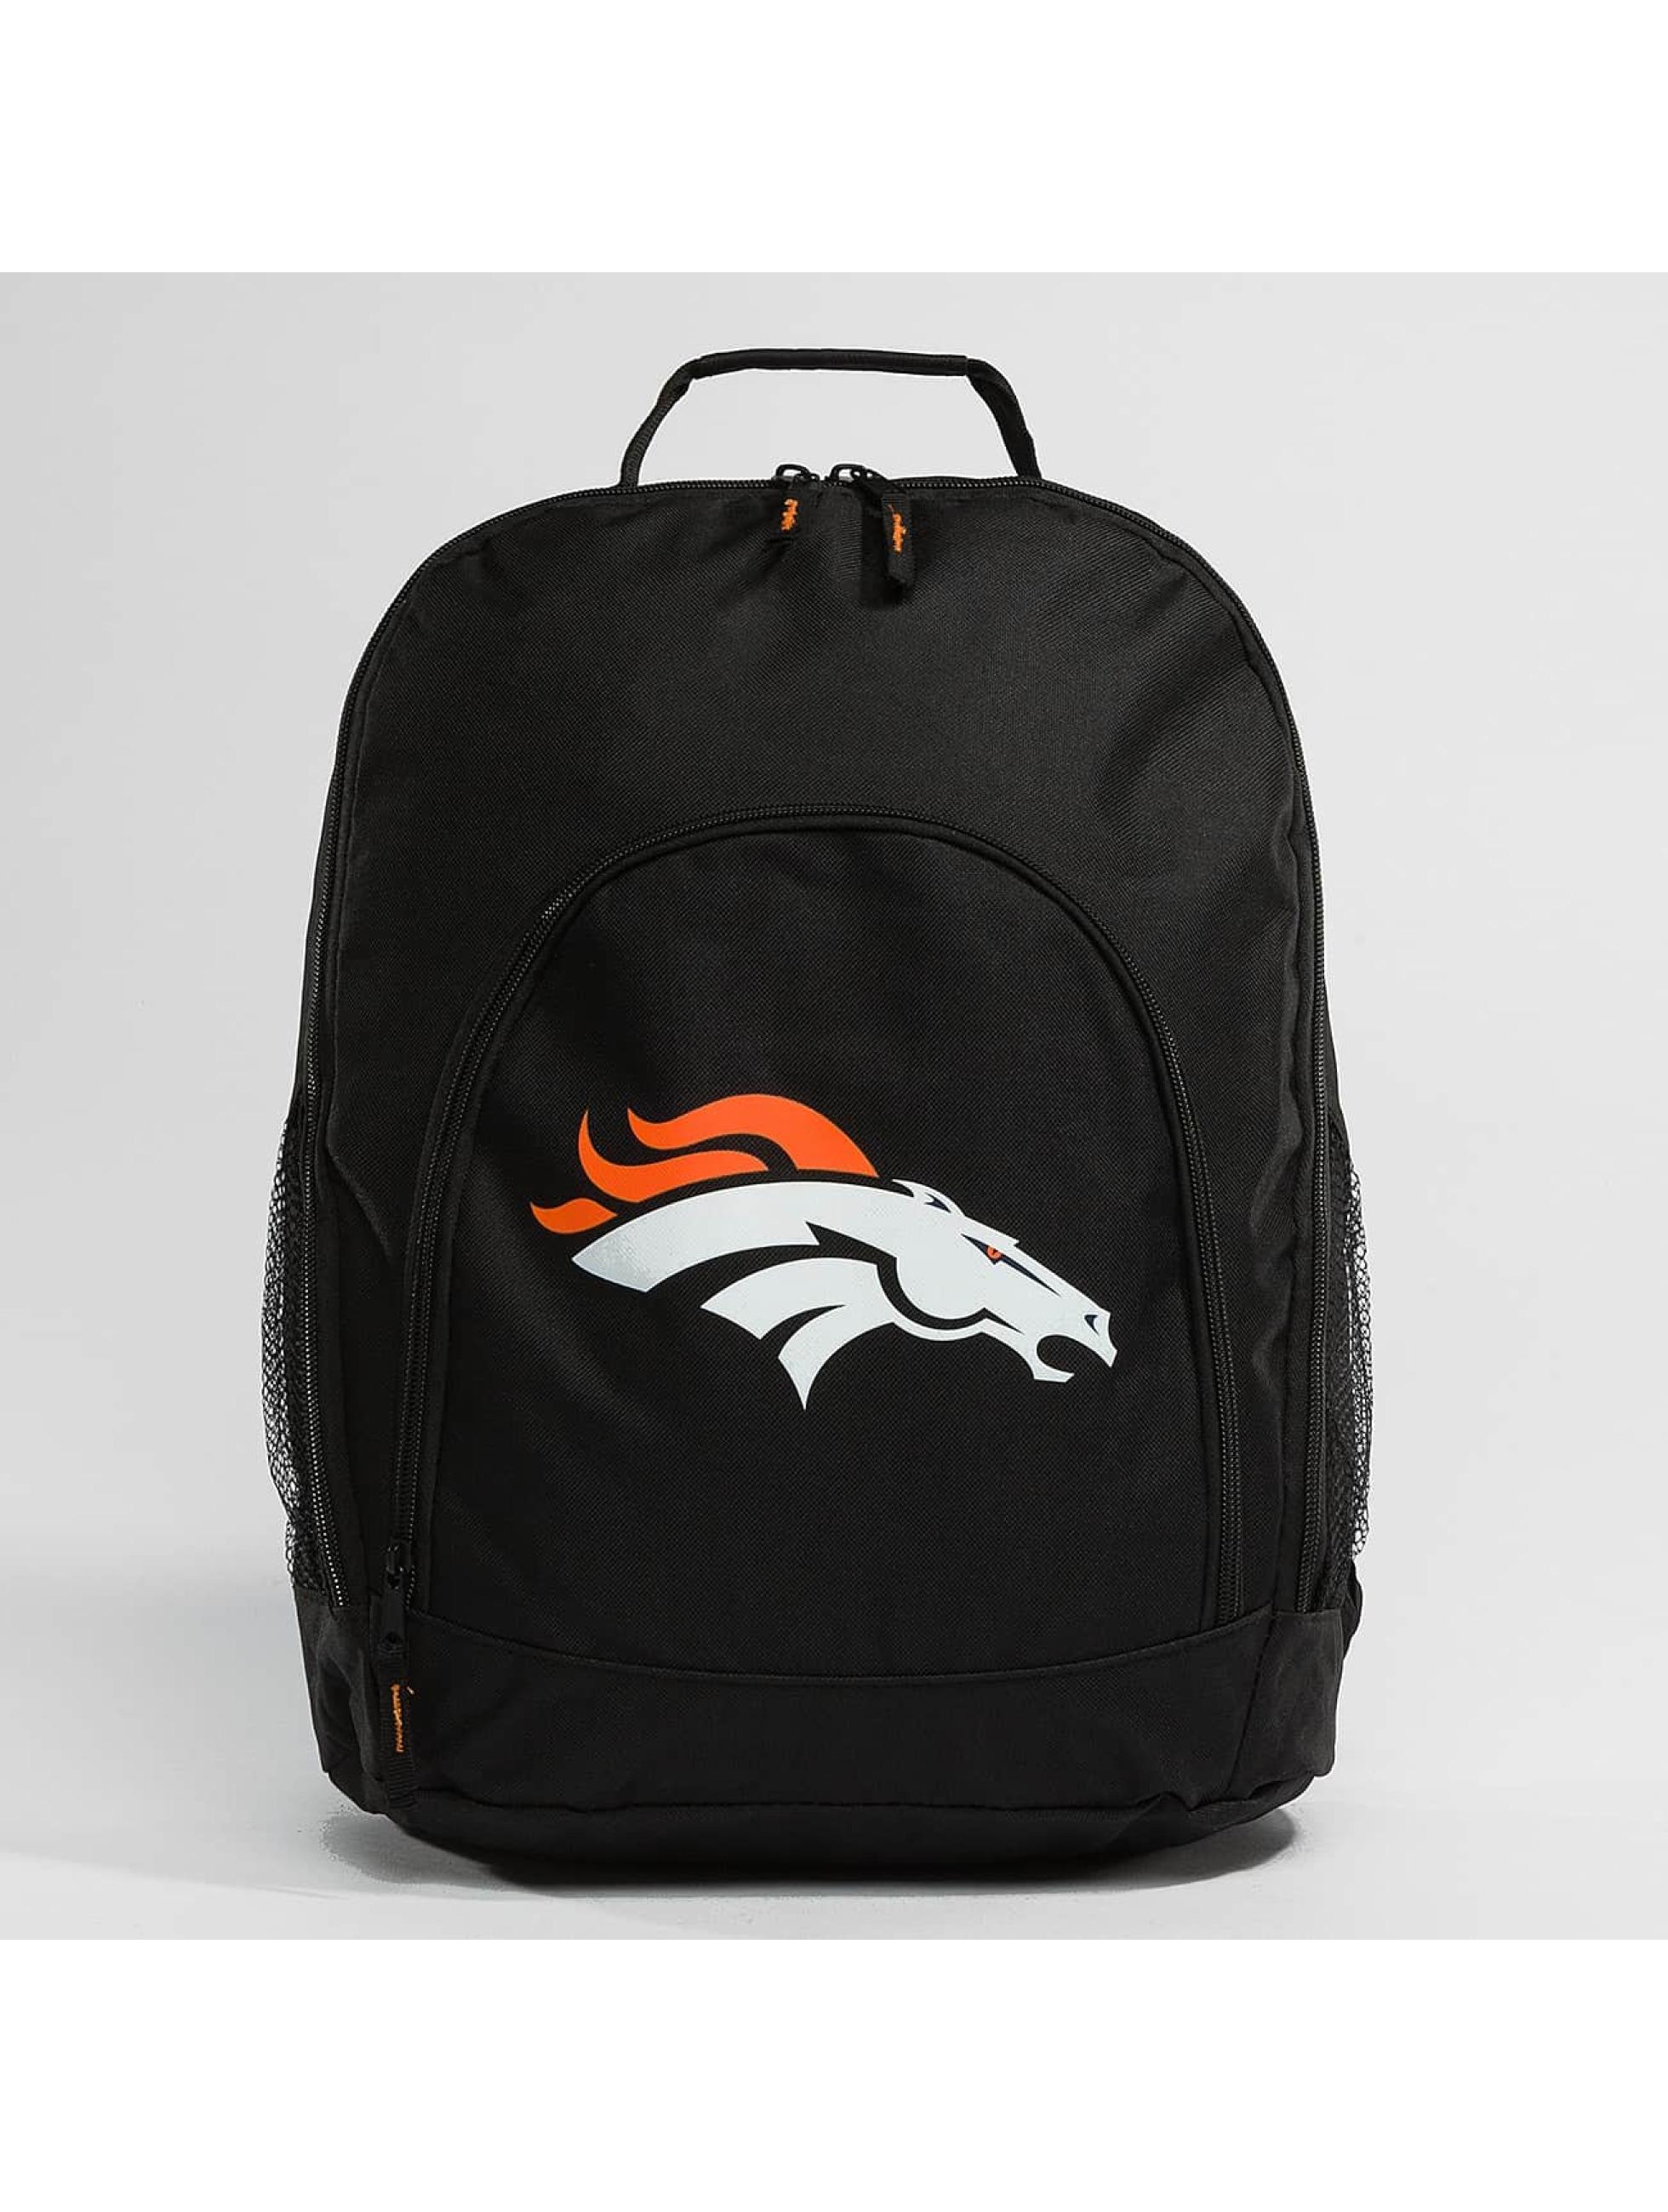 Forever Collectibles Männer,Frauen Rucksack NFL Denver Broncos in schwarz